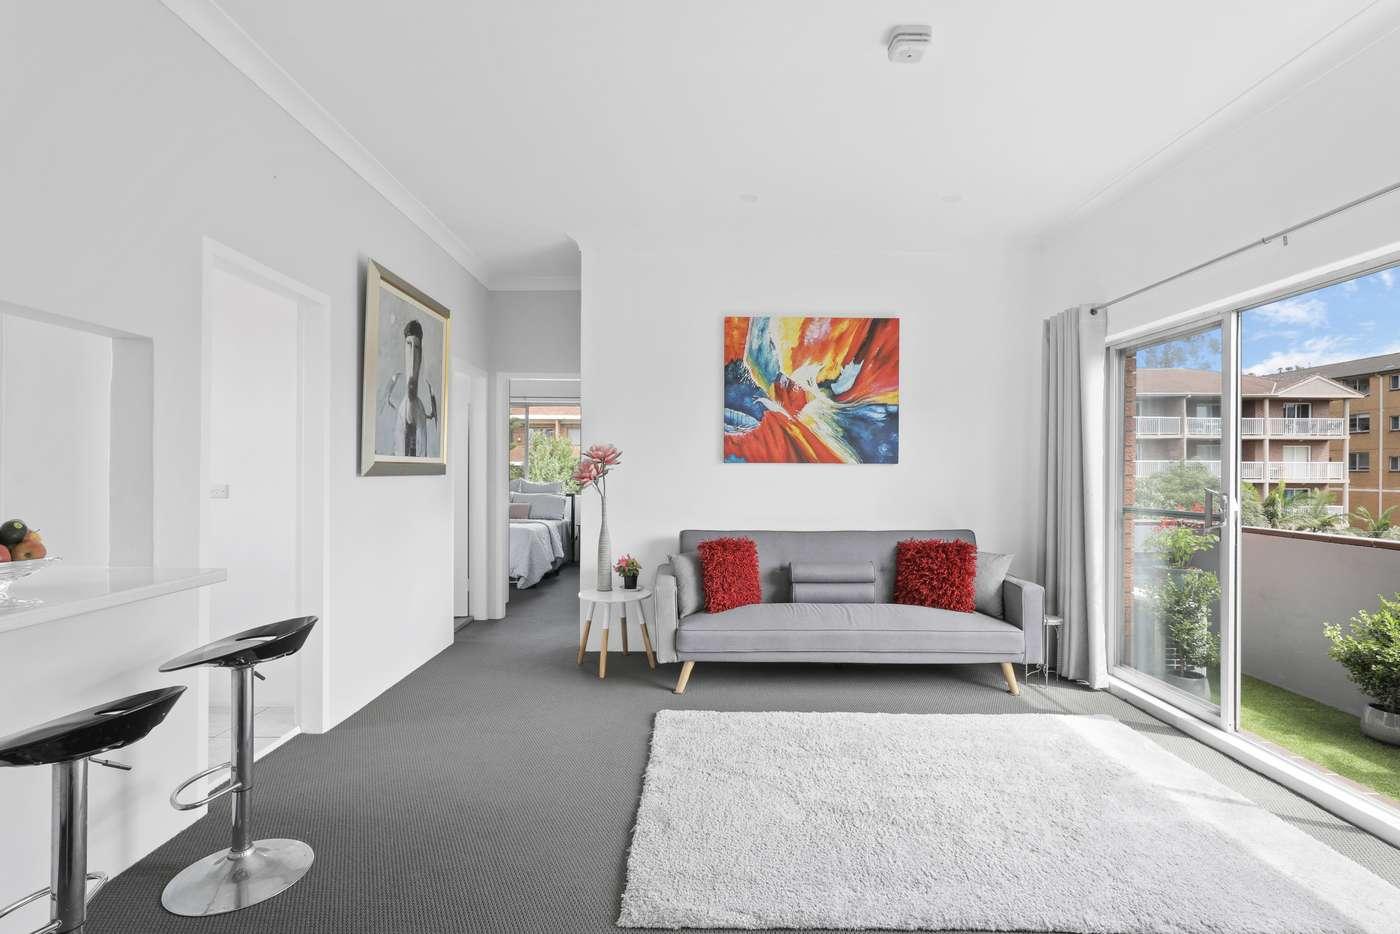 Main view of Homely apartment listing, 5/31 Boronia Street, Kensington NSW 2033